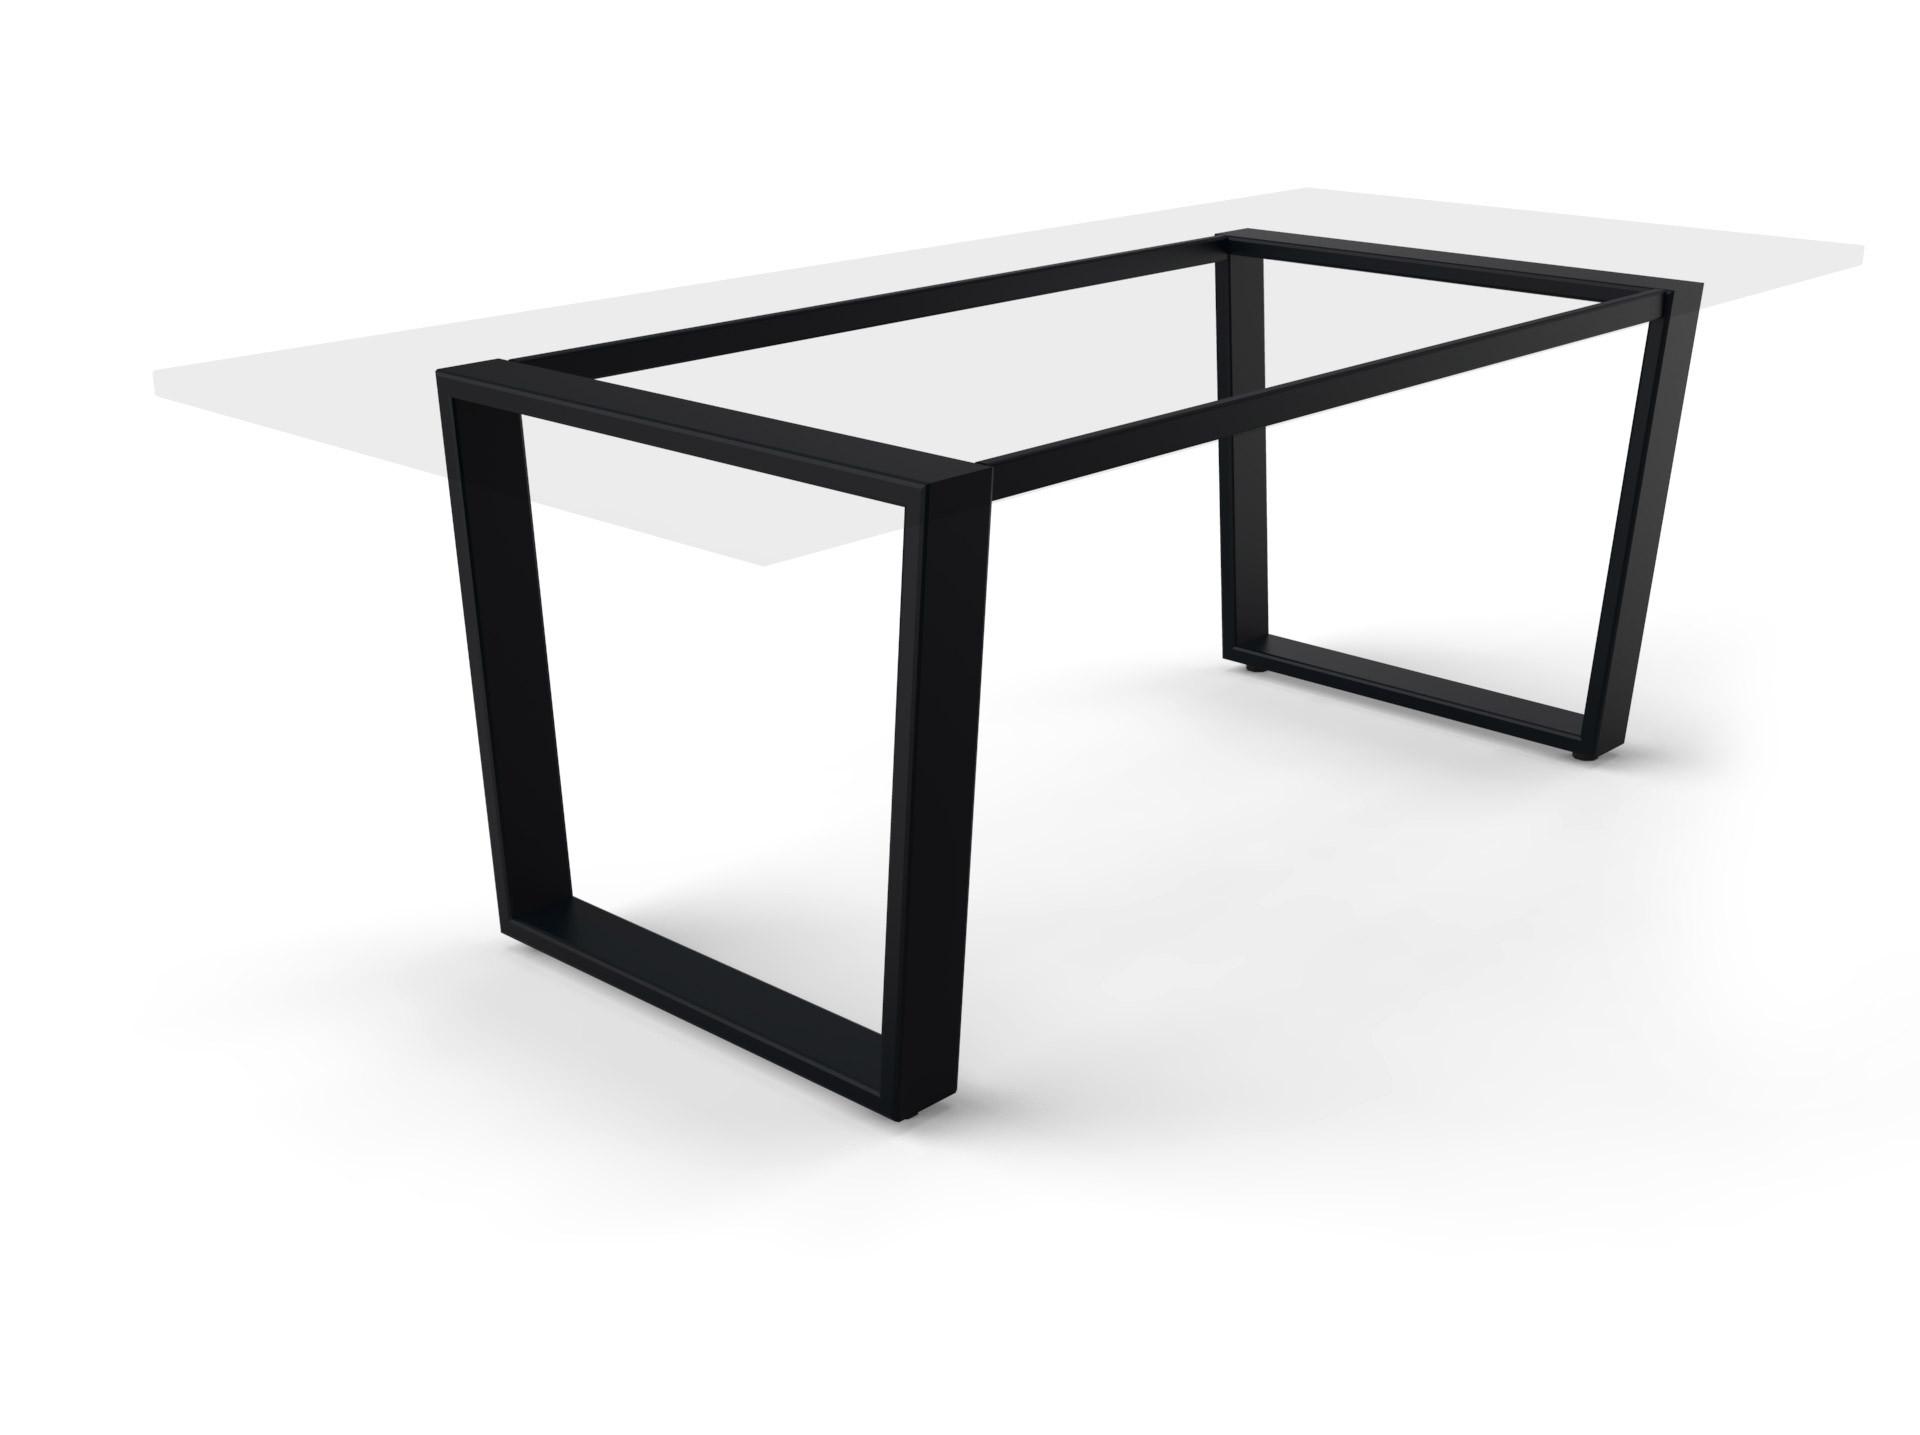 Tischgestell Savona